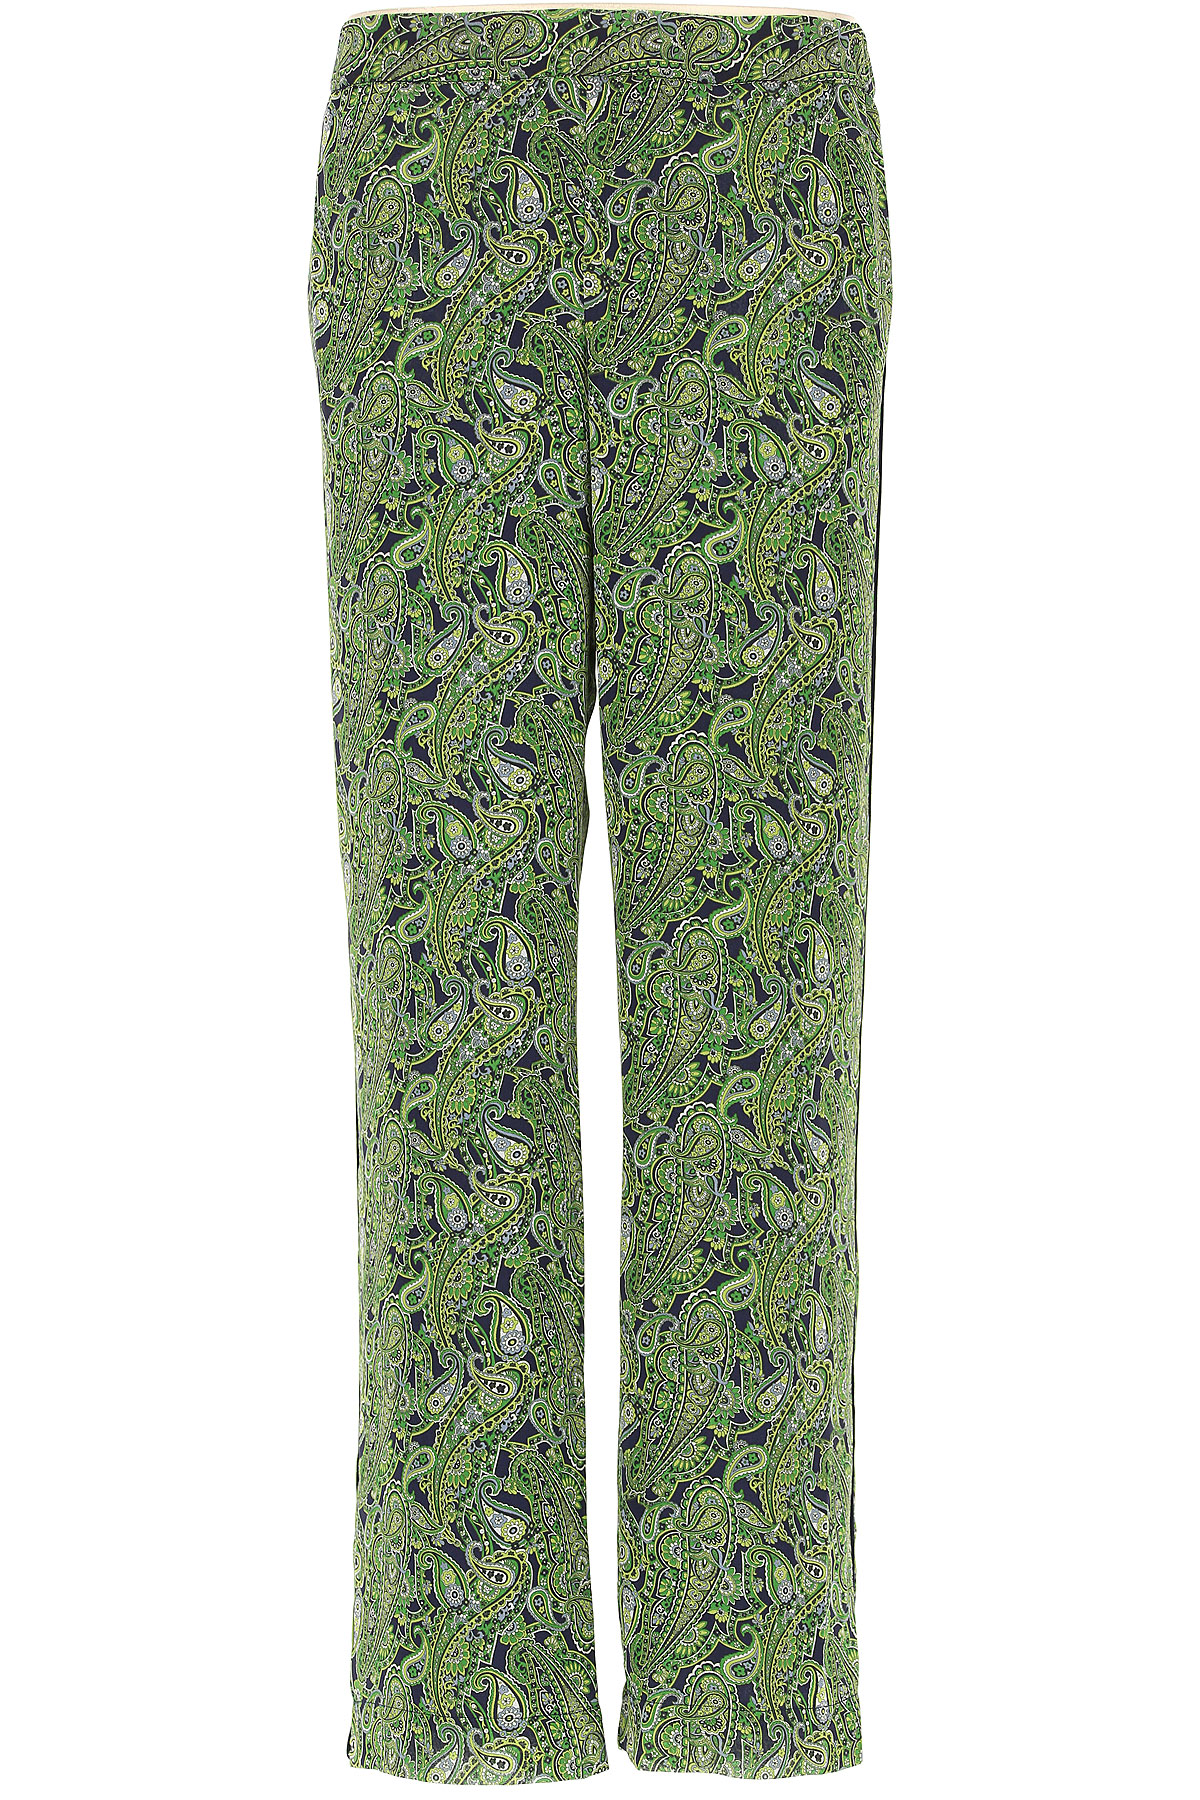 Michael Kors Pantaloni Donna, Verde, polyester, 2019, 38 40